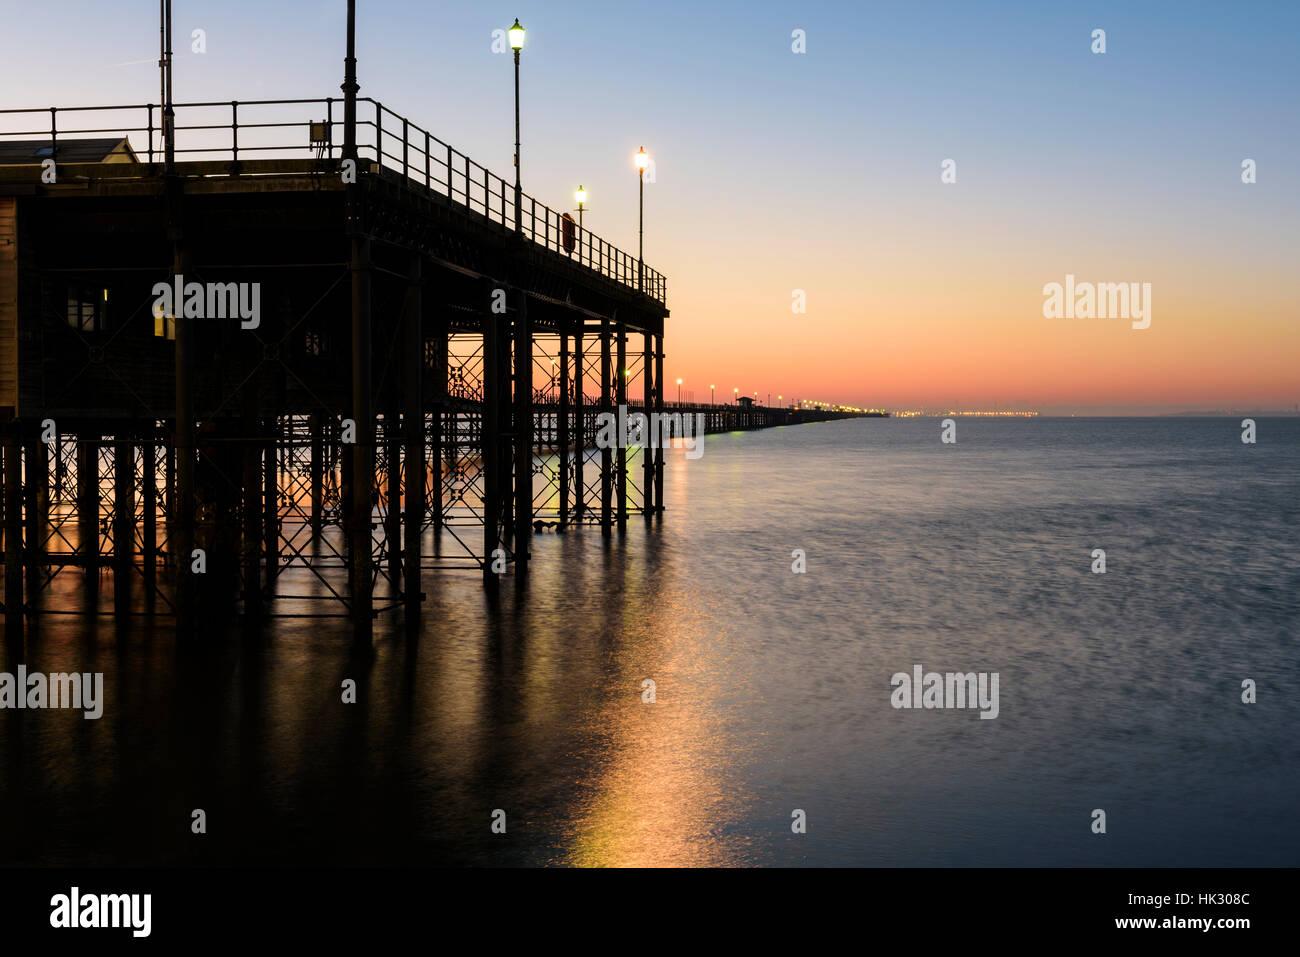 Sunrise under the pier - Stock Image